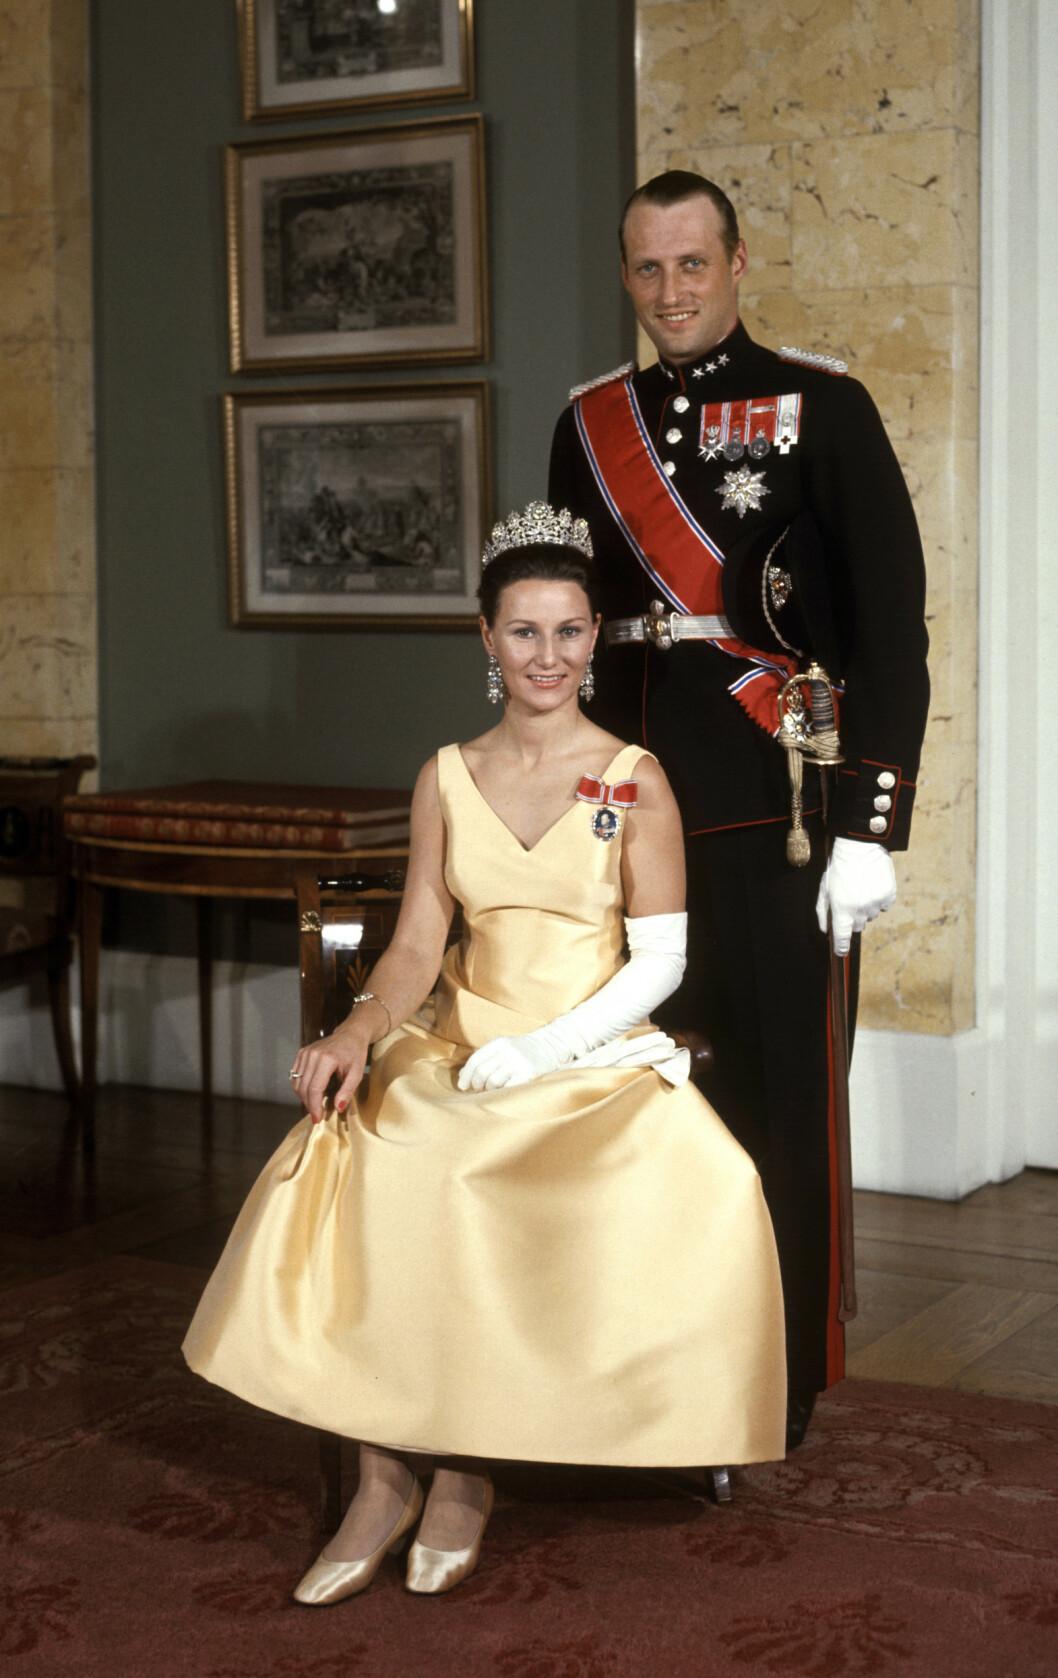 GALLA: Kronprinsparet fotografert høsten 1969. Kongen bar uniform, mens kronprinsesse Sonja var ikledd en kledelig gul kjole. FOTO: NTB Scanpix